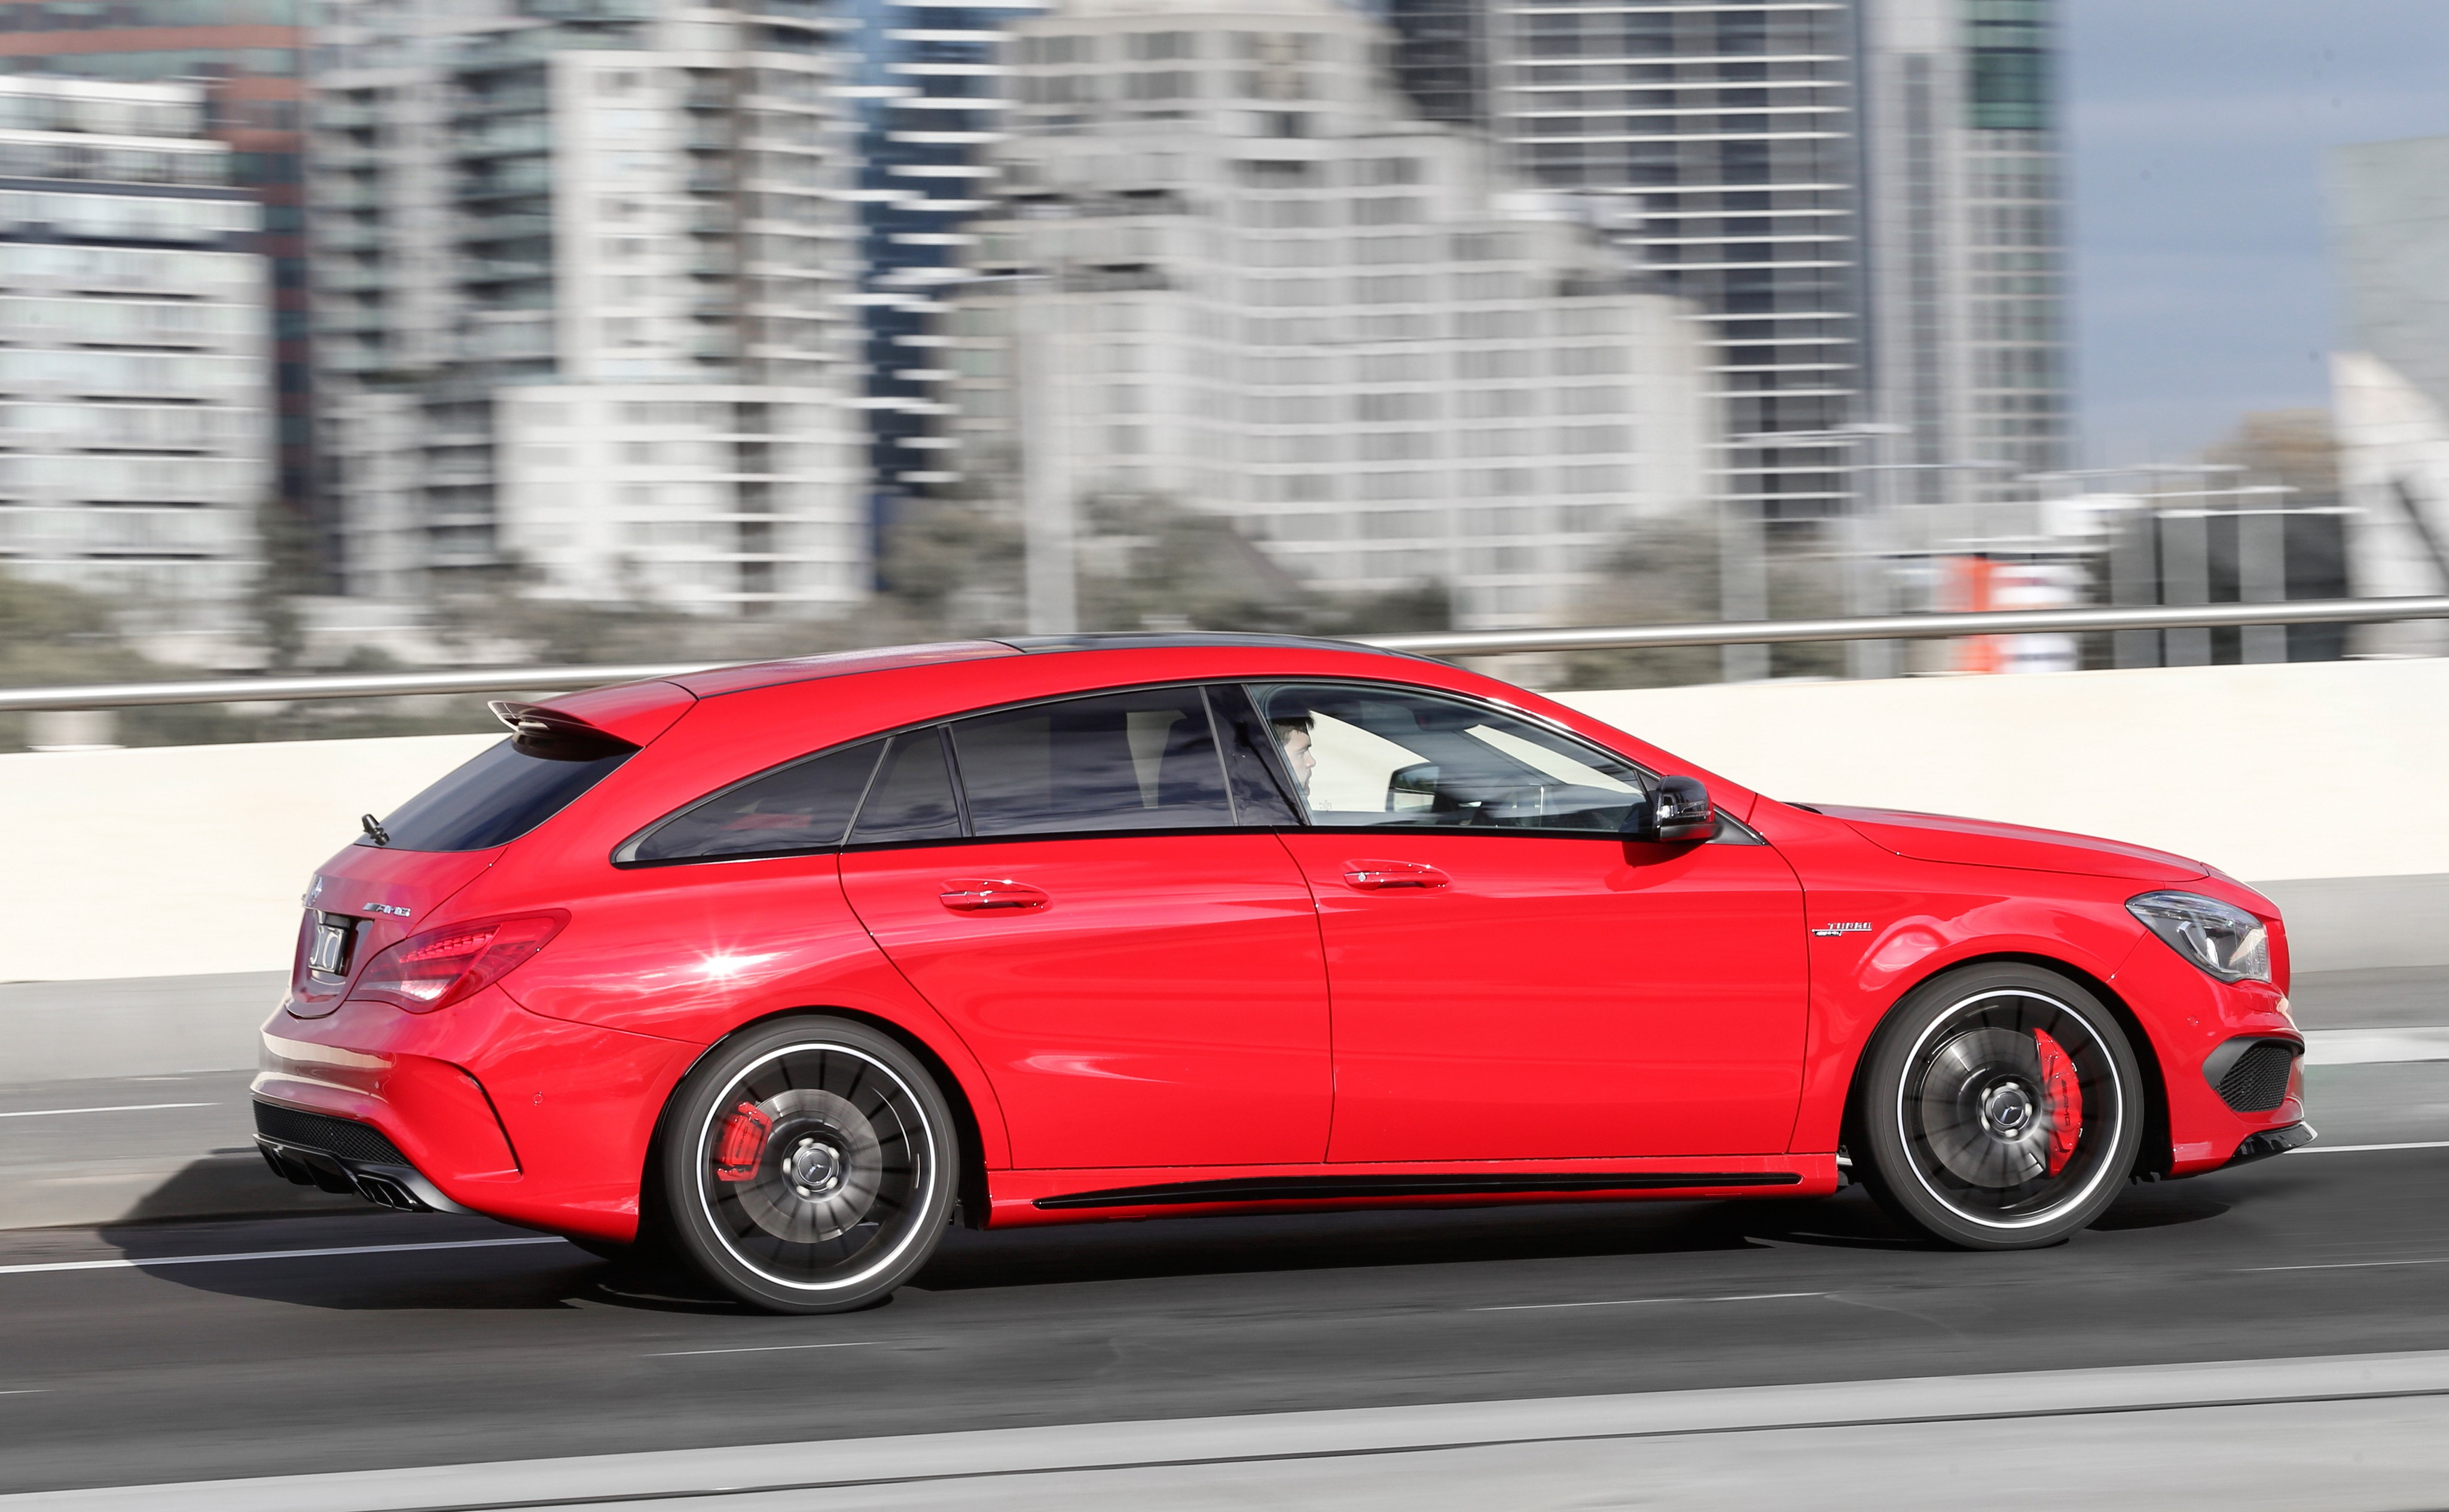 Mercedes benz cla 45 amg shooting brake 2015 2016 2017 for Red mercedes benz cla